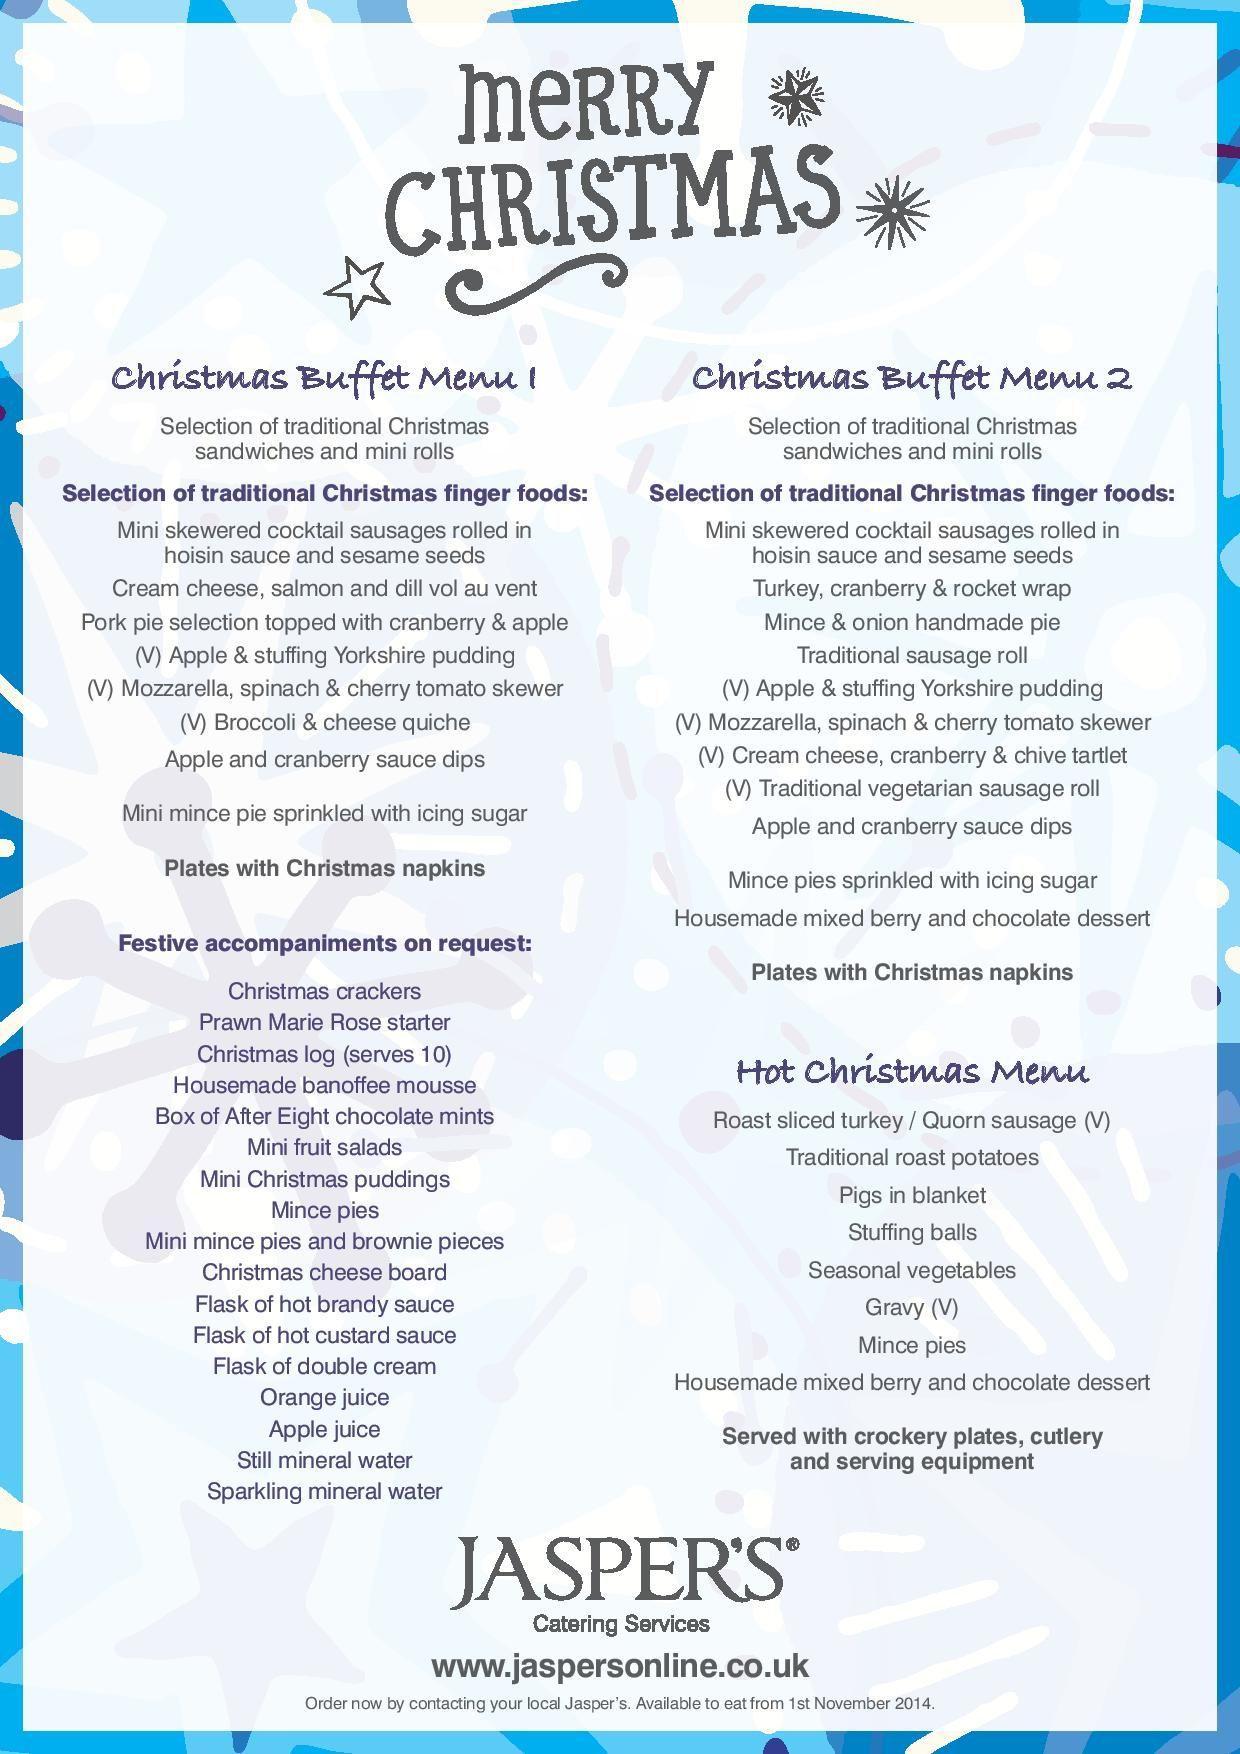 Christmas Buffet Menus.Pin By Jasper S Sunderland On Introduction To Jasper S